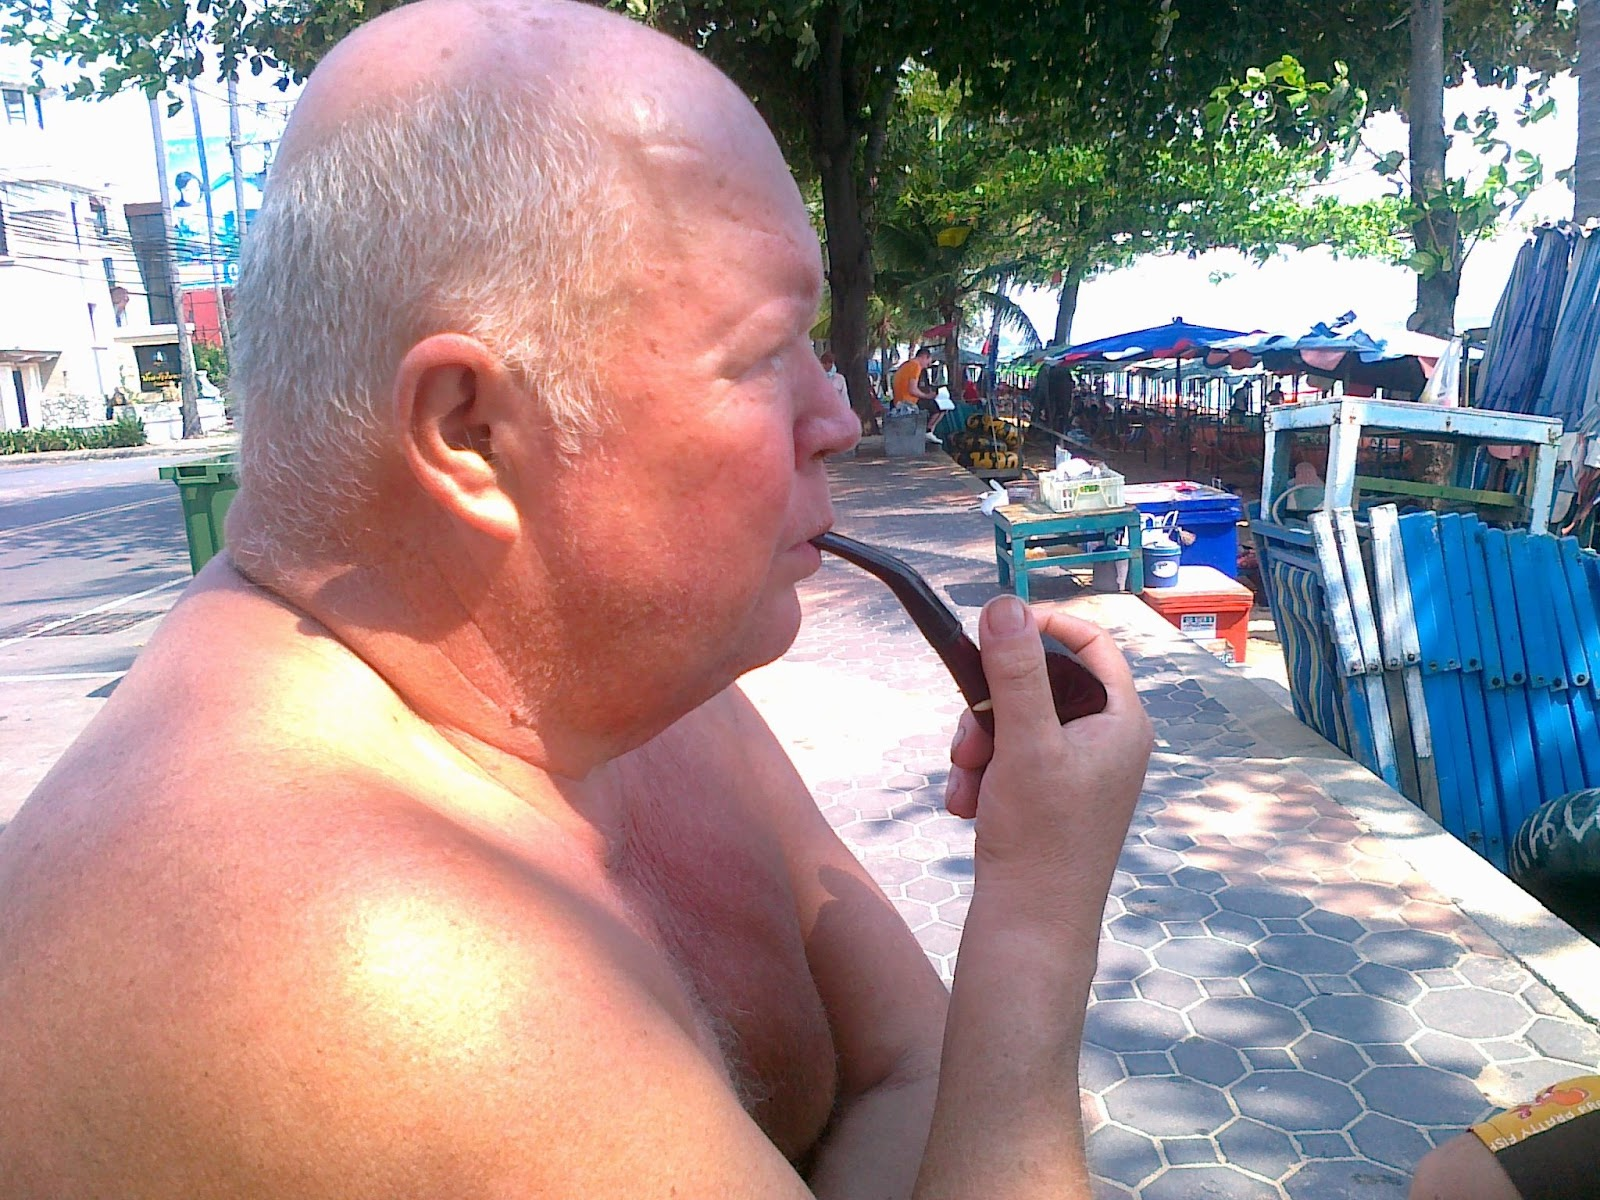 thai hieronta lappeenranta kreeta kokemuksia